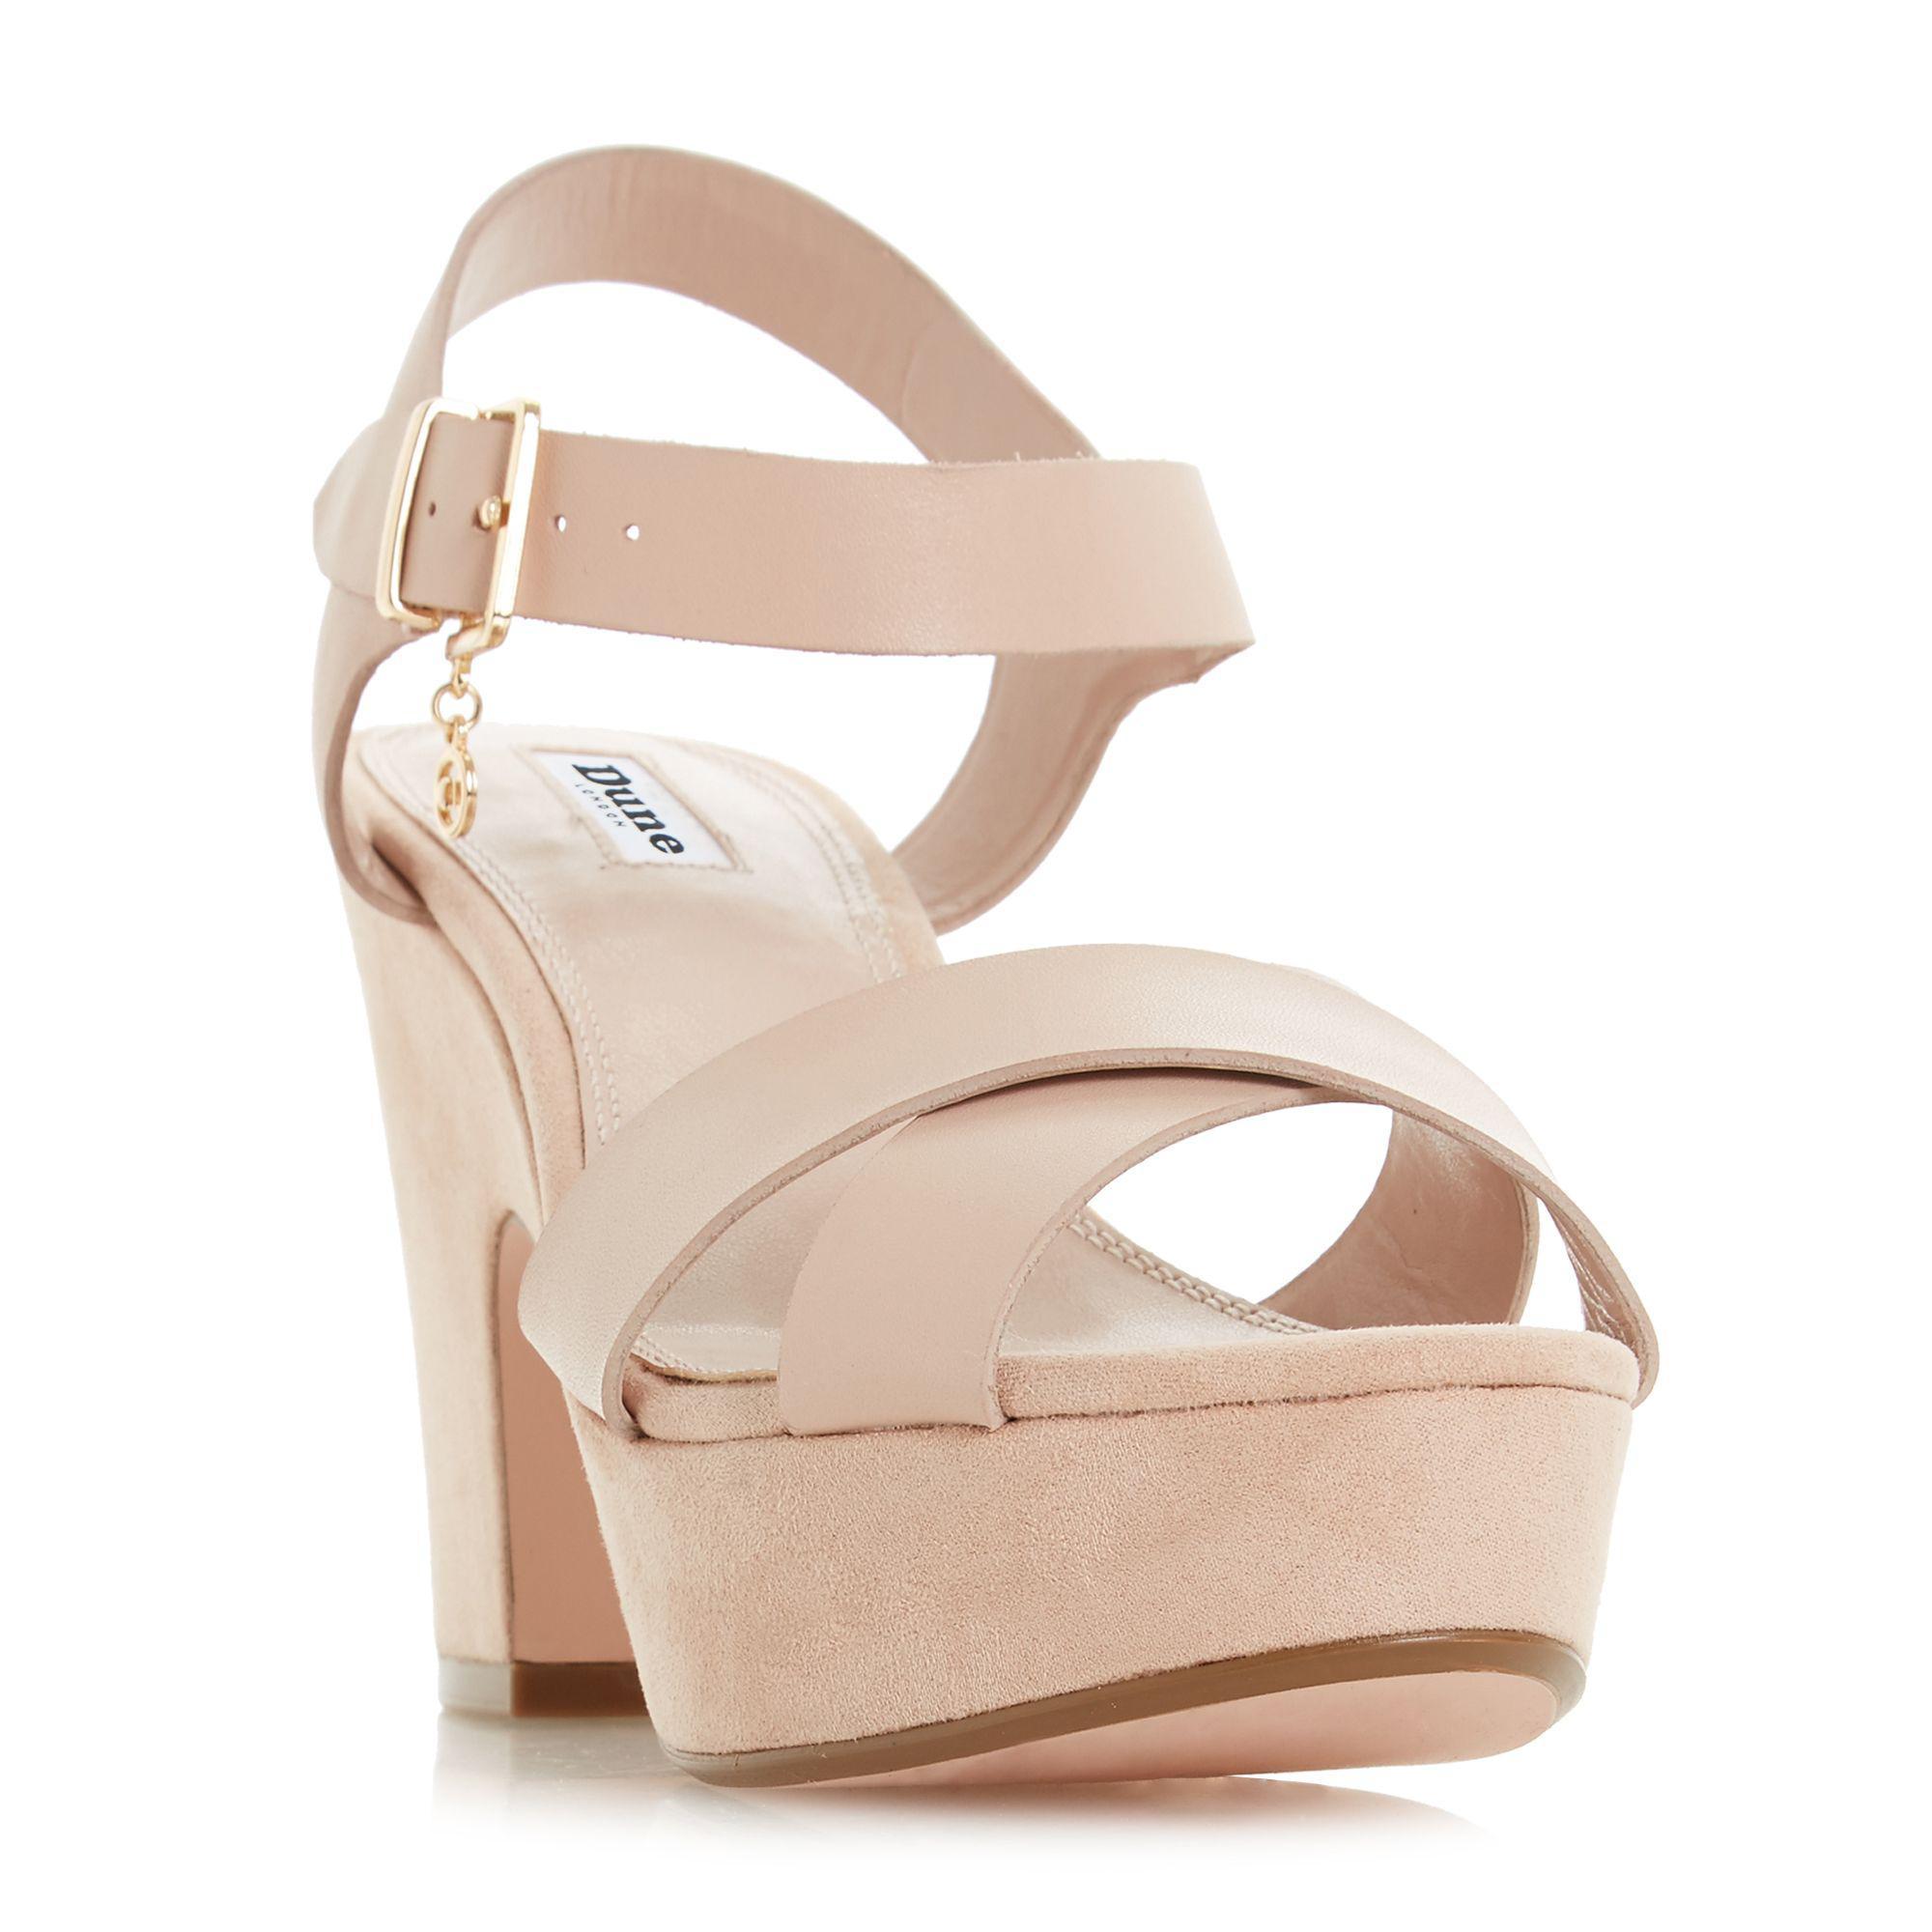 86b43e5b449 Dune - Light Pink Suede  iyla  High Block Heel Ankle Strap Sandals - Lyst.  View fullscreen